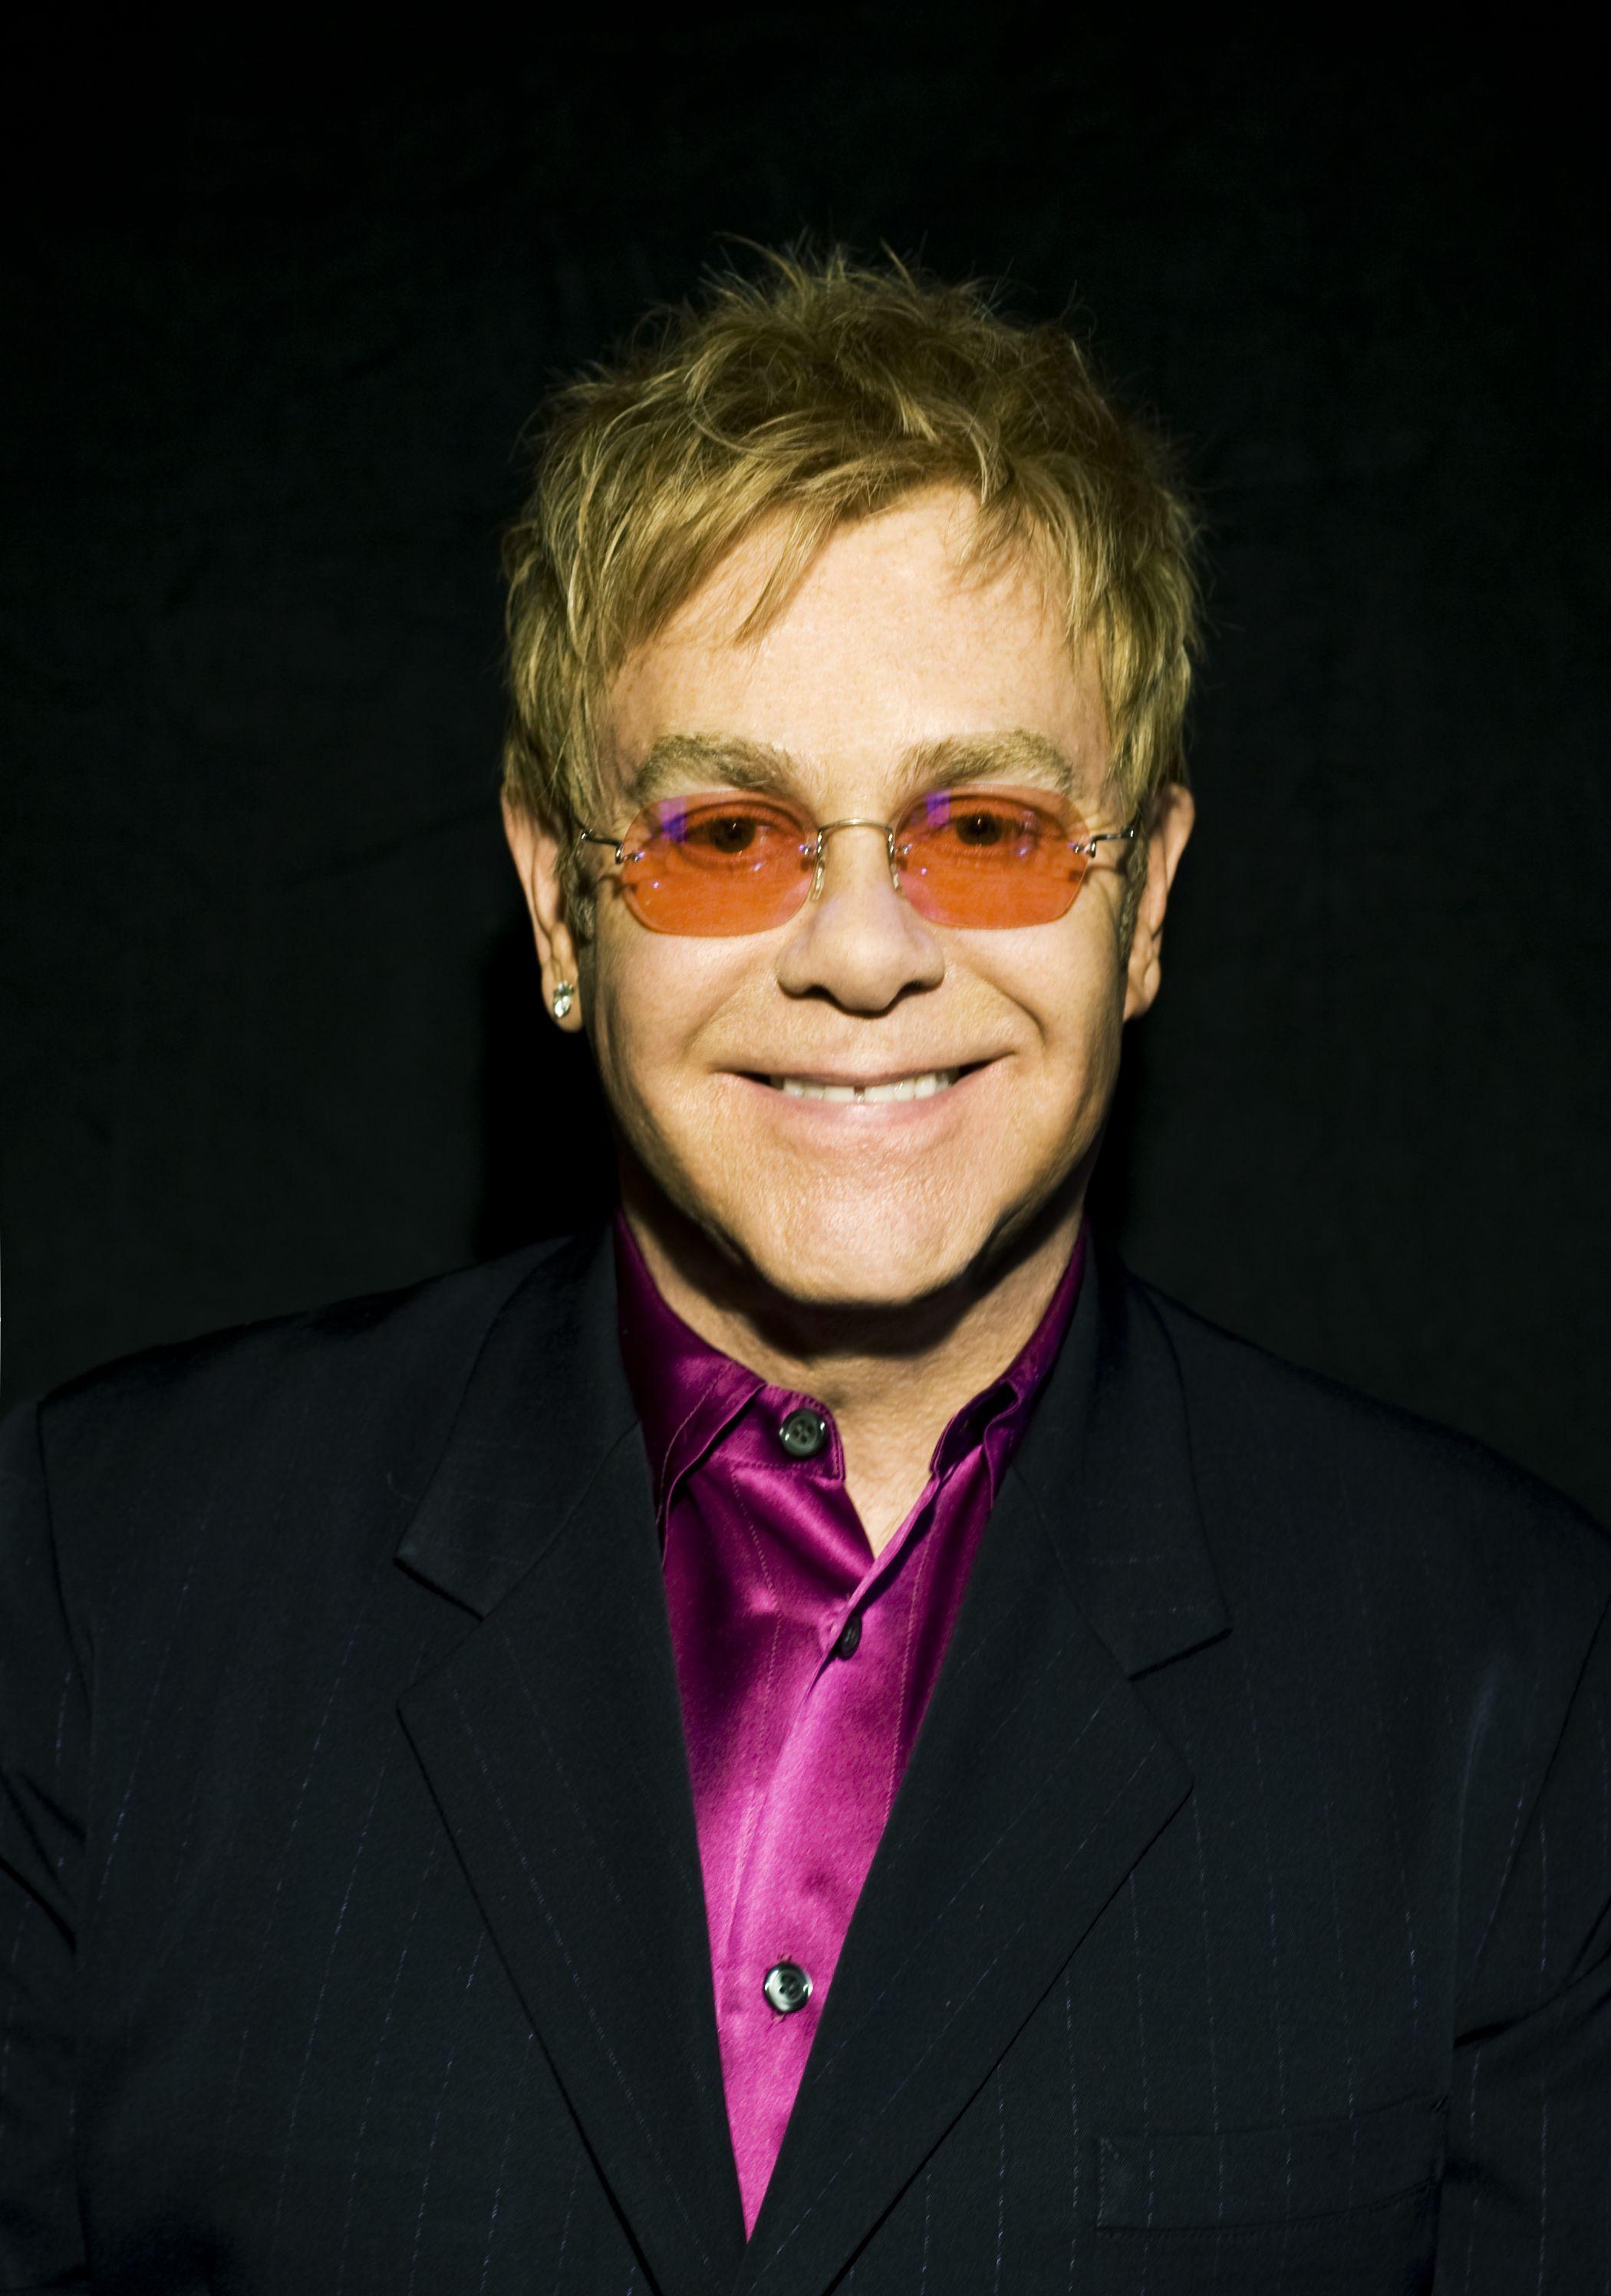 Laura Slatkin And Sir Elton John Announce The Addition Of